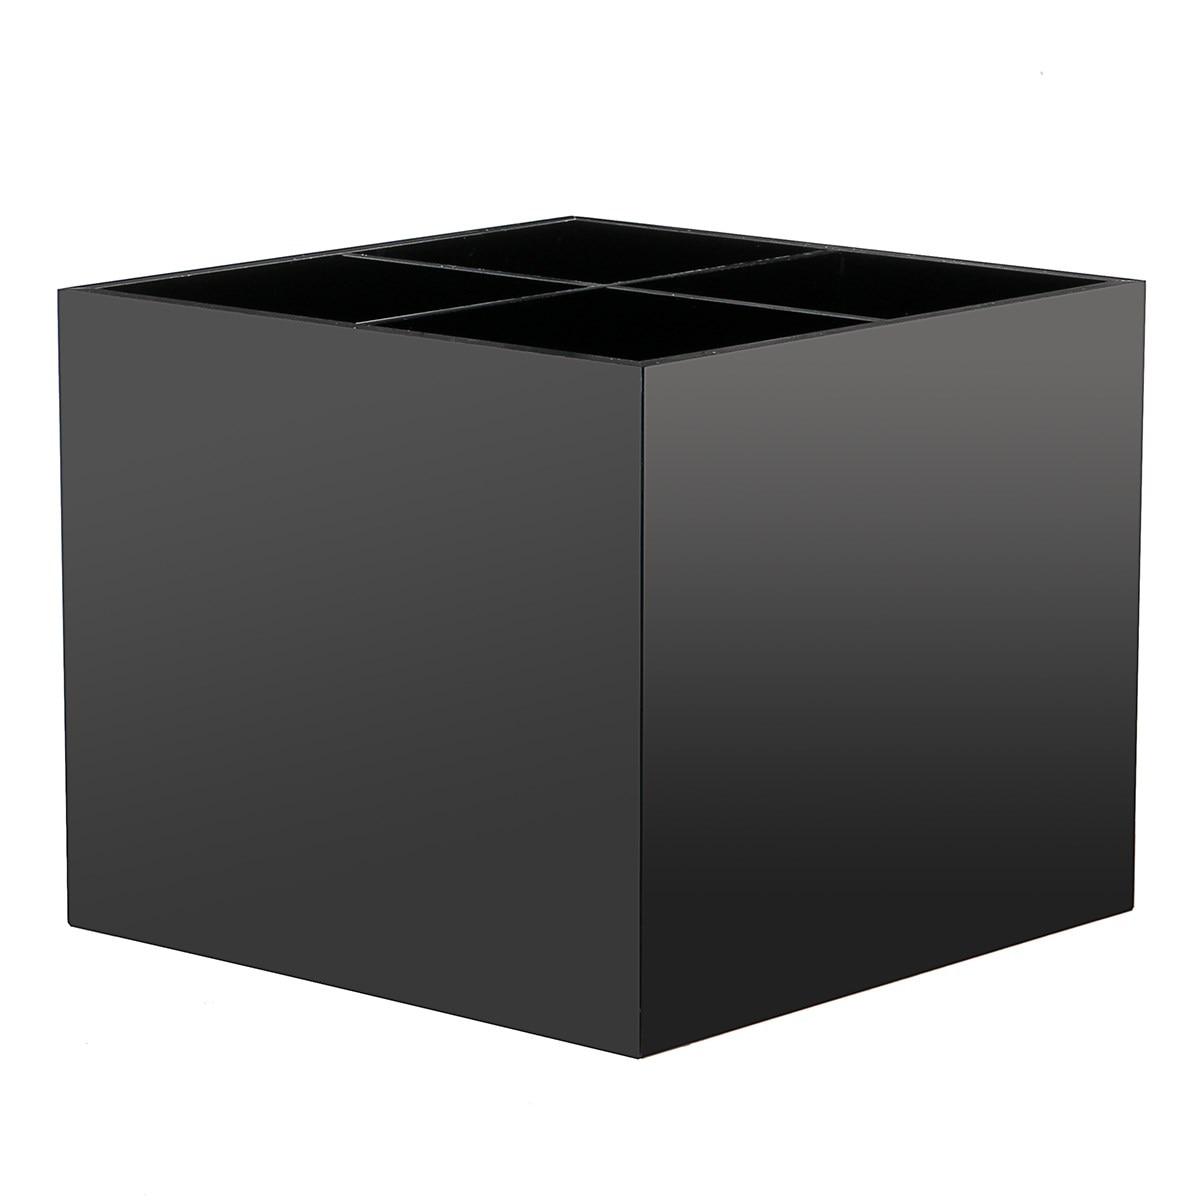 New 4 Grids Black Acrylic Cosmetic Organizer Box Makeup Tools Holder